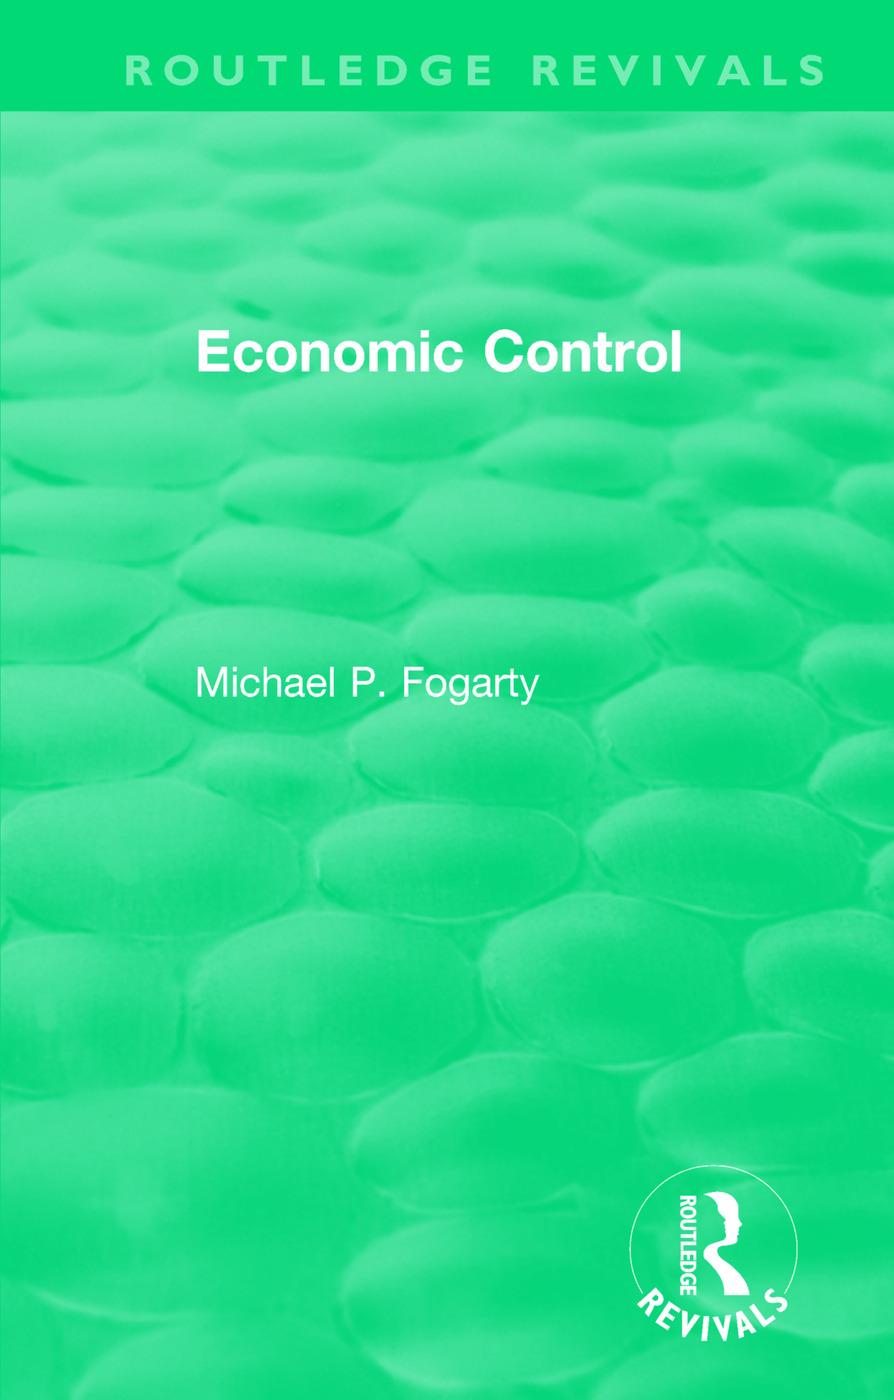 Routledge Revivals: Economic Control (1955) book cover